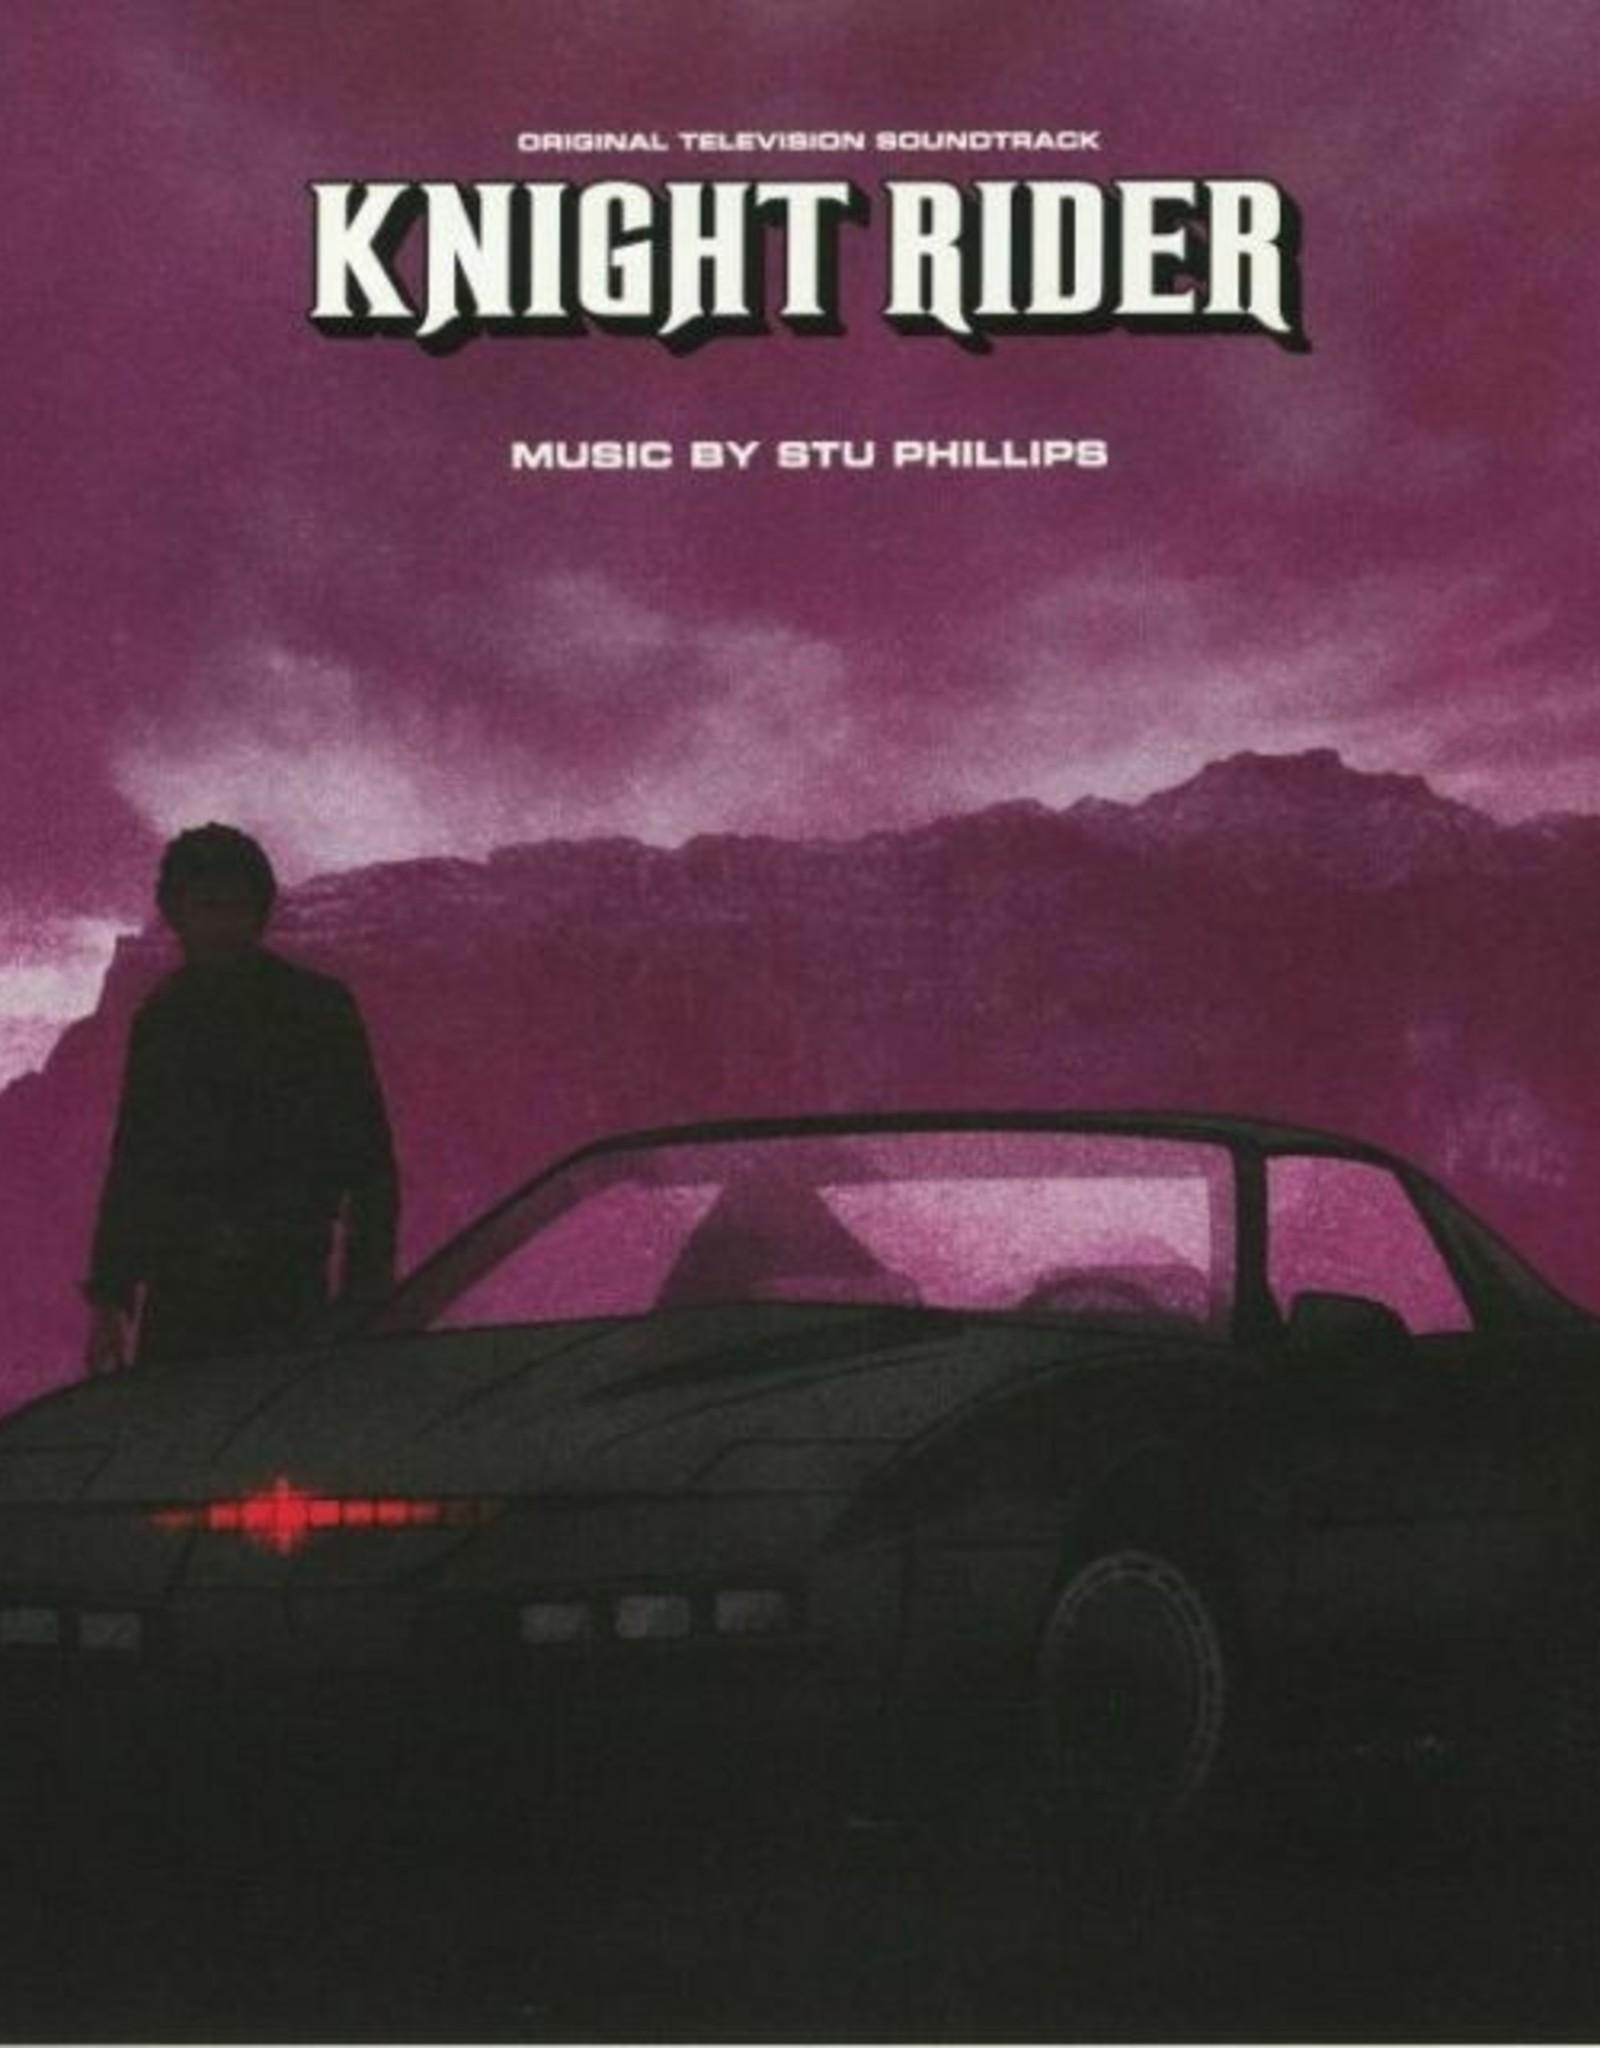 Stu Phillips - Knight Rider Ost (2Lp/Gatefold) (RSD 2019)